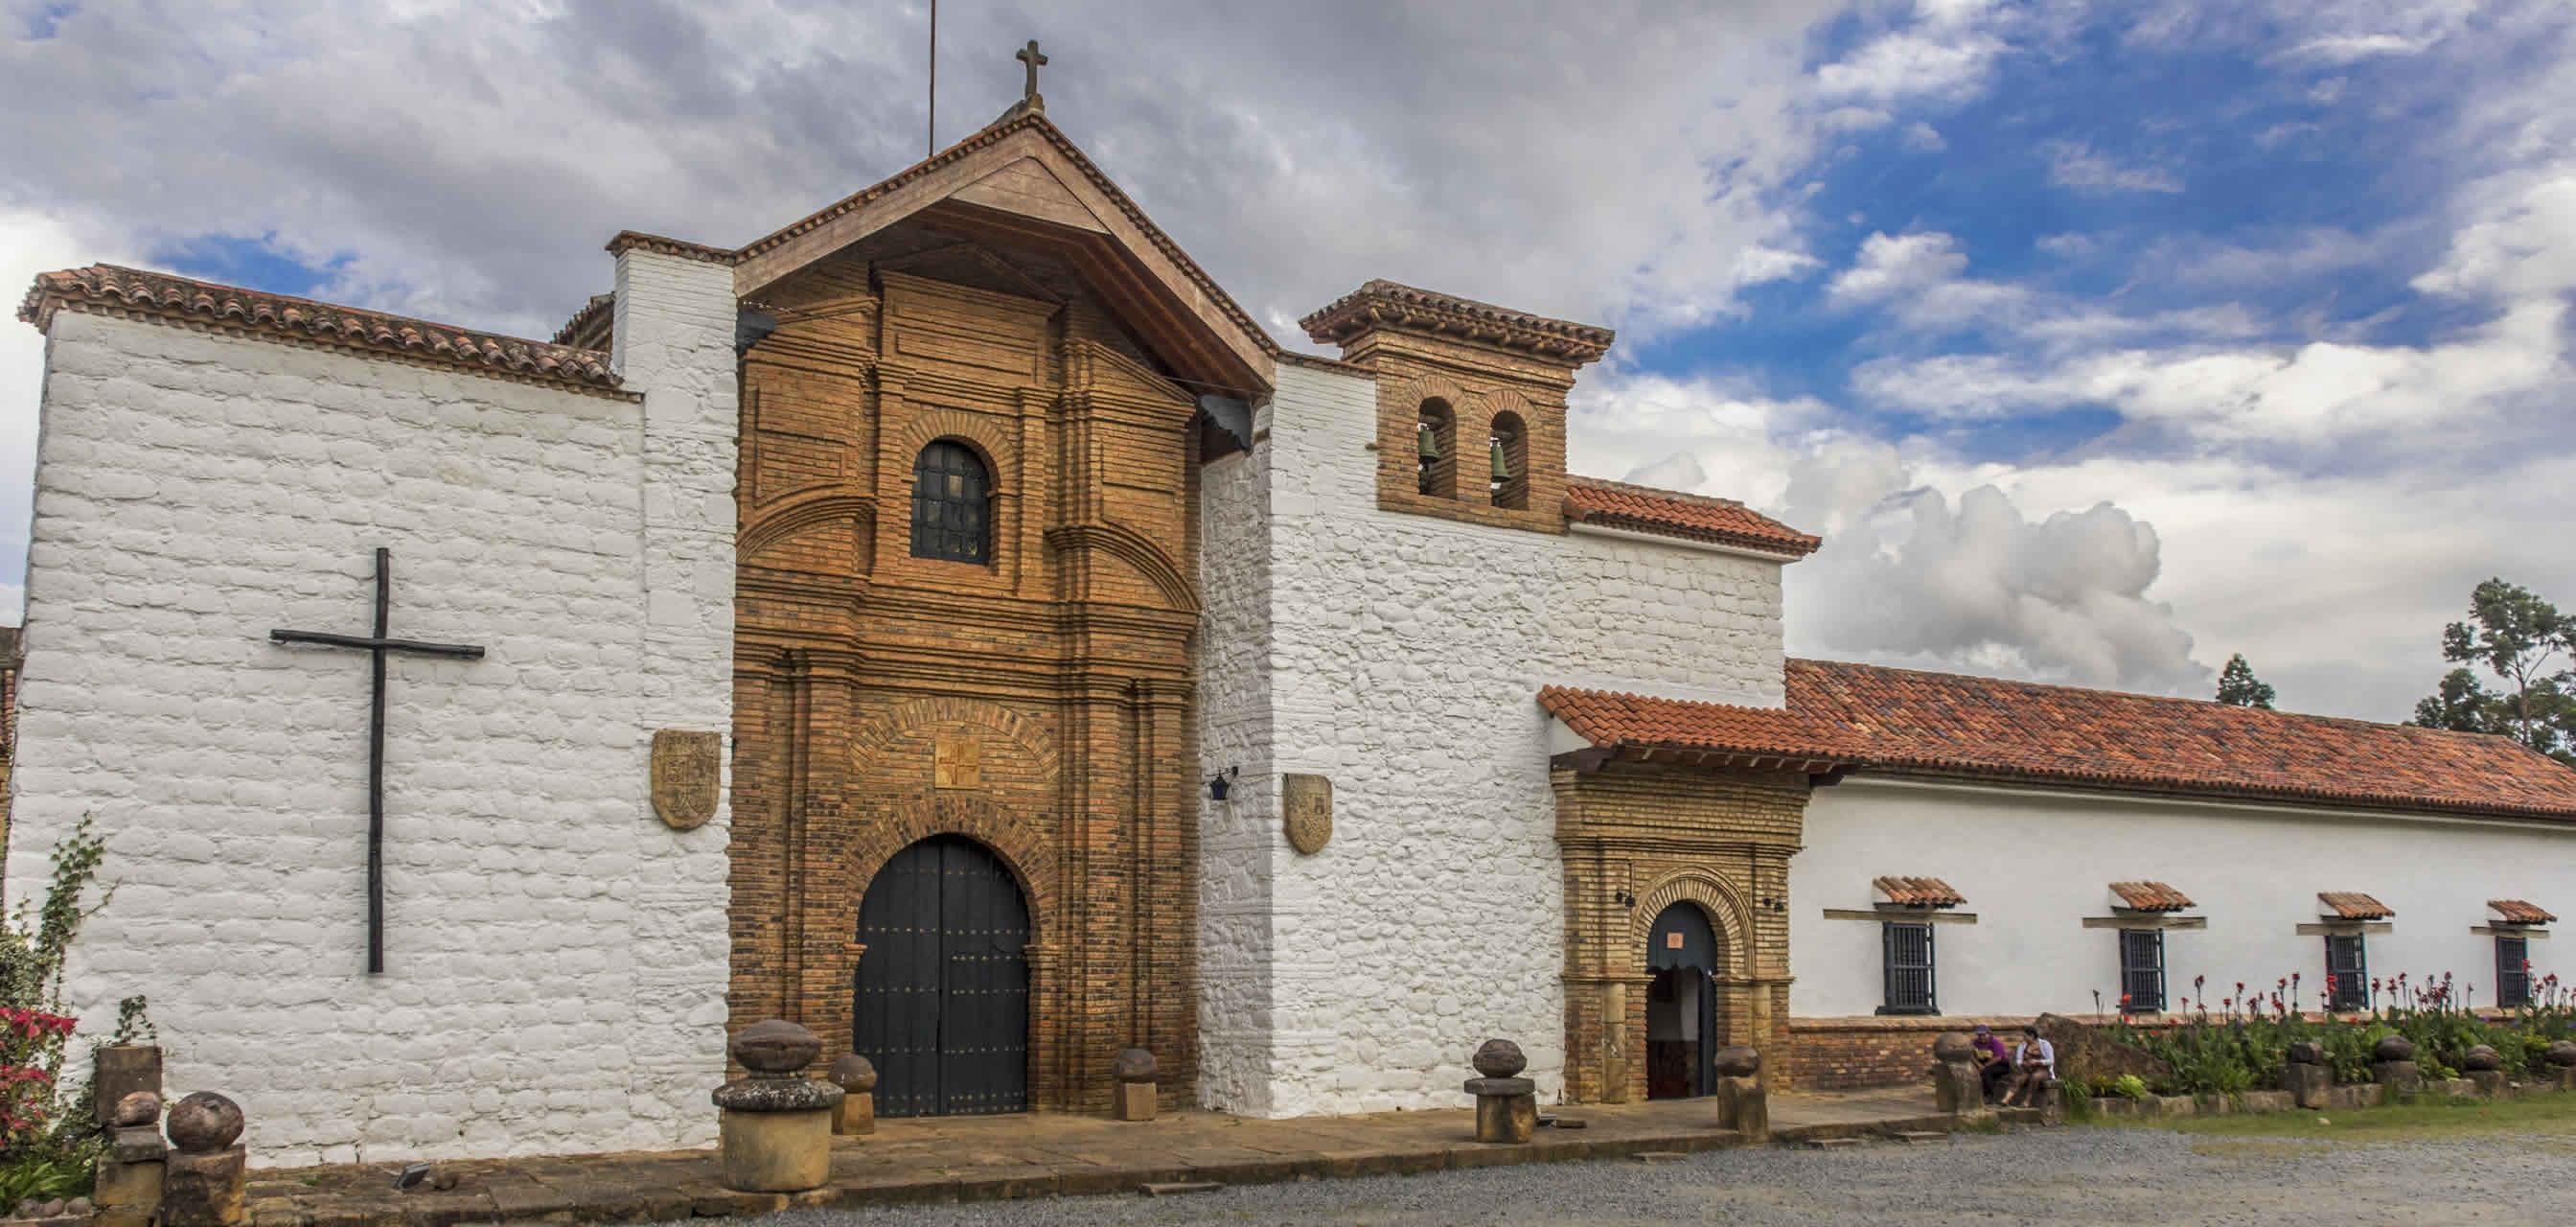 Convento de Santo Ecce-Homo de Villa de Leyva